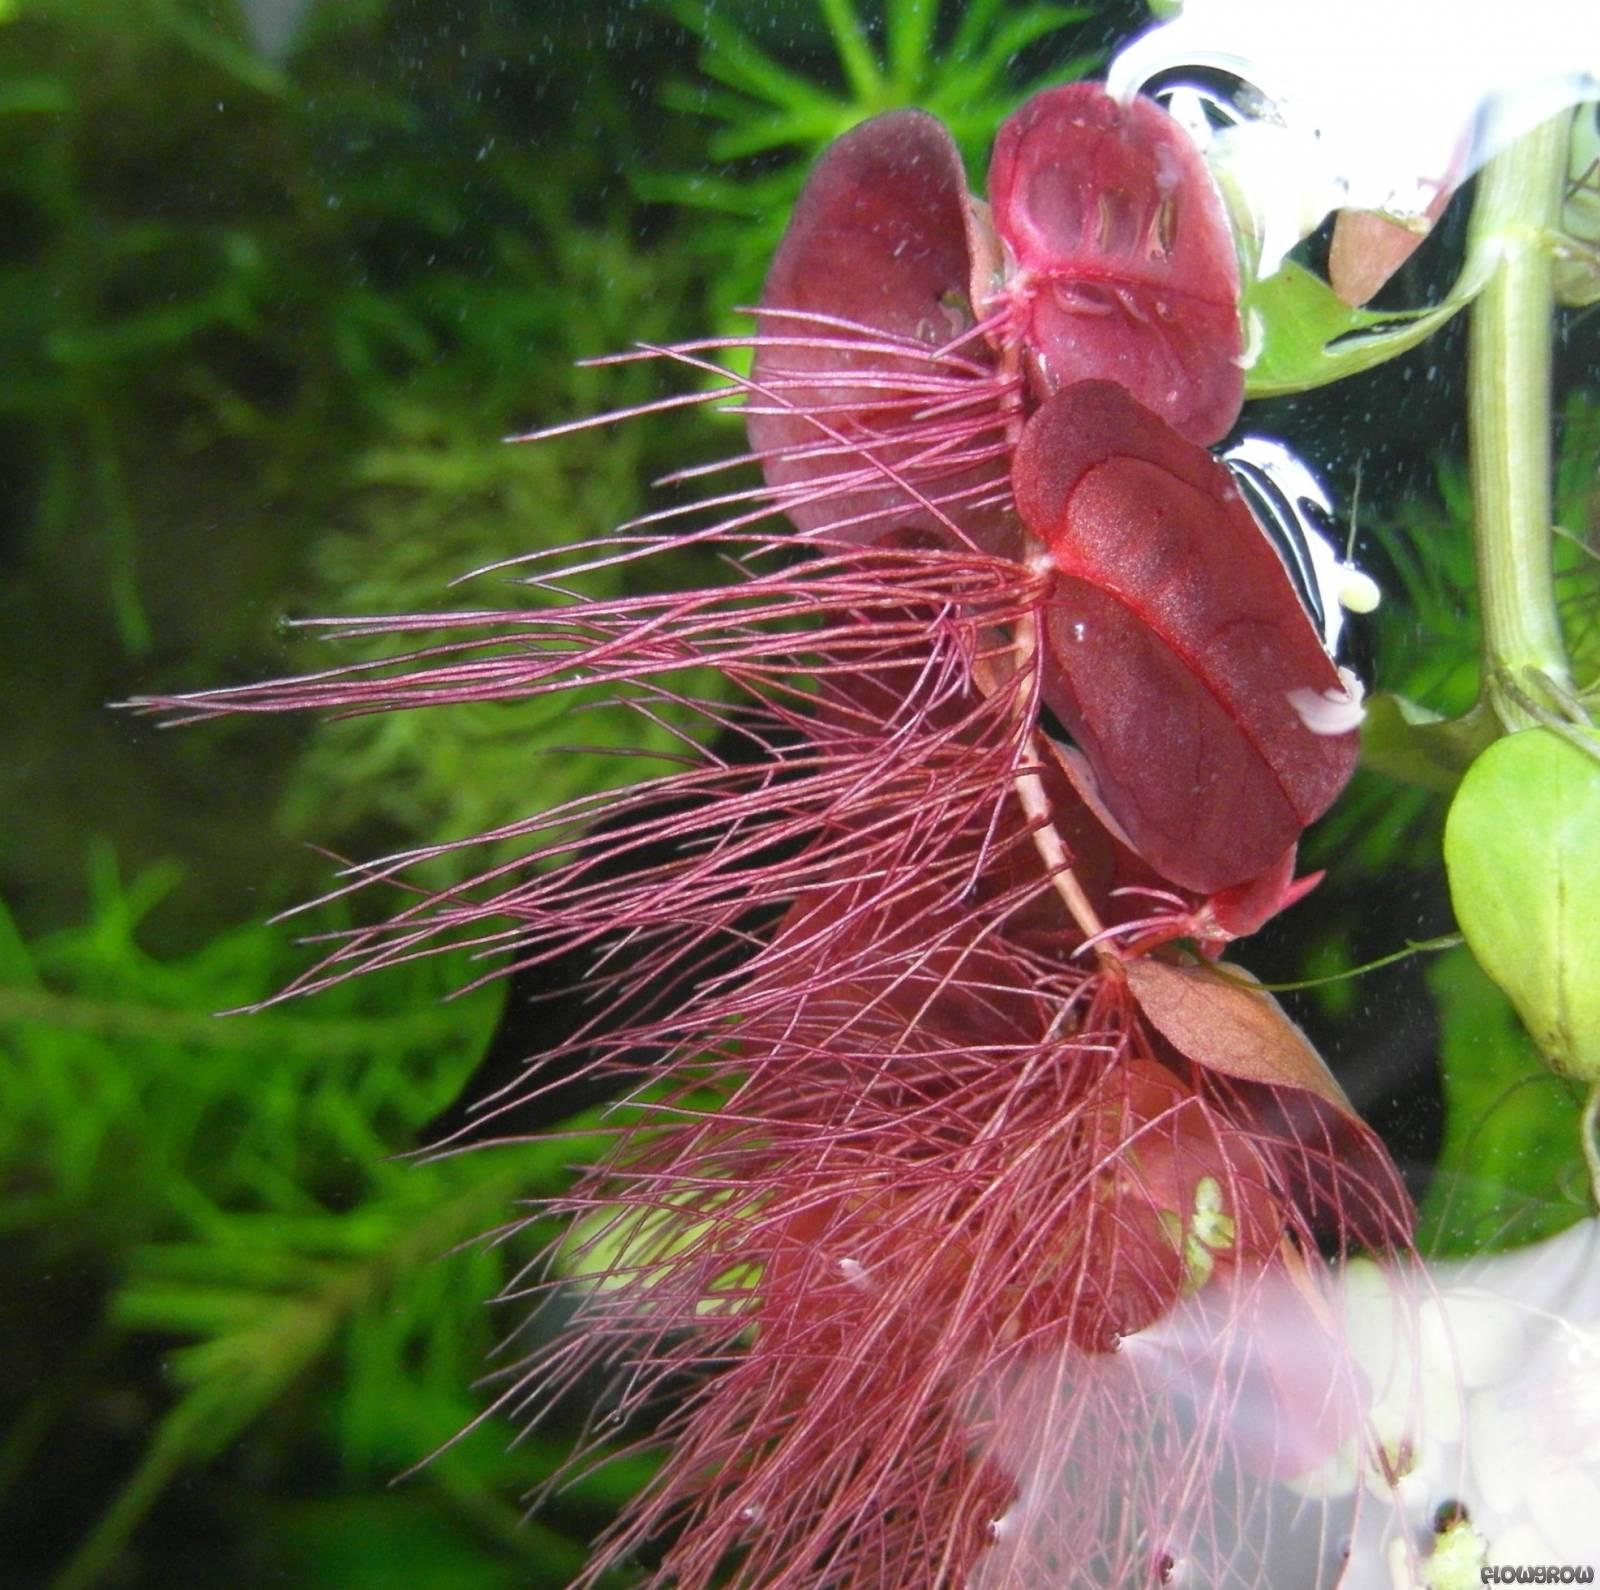 phyllanthus-fluitans-5308cb6d83fc8.jpg